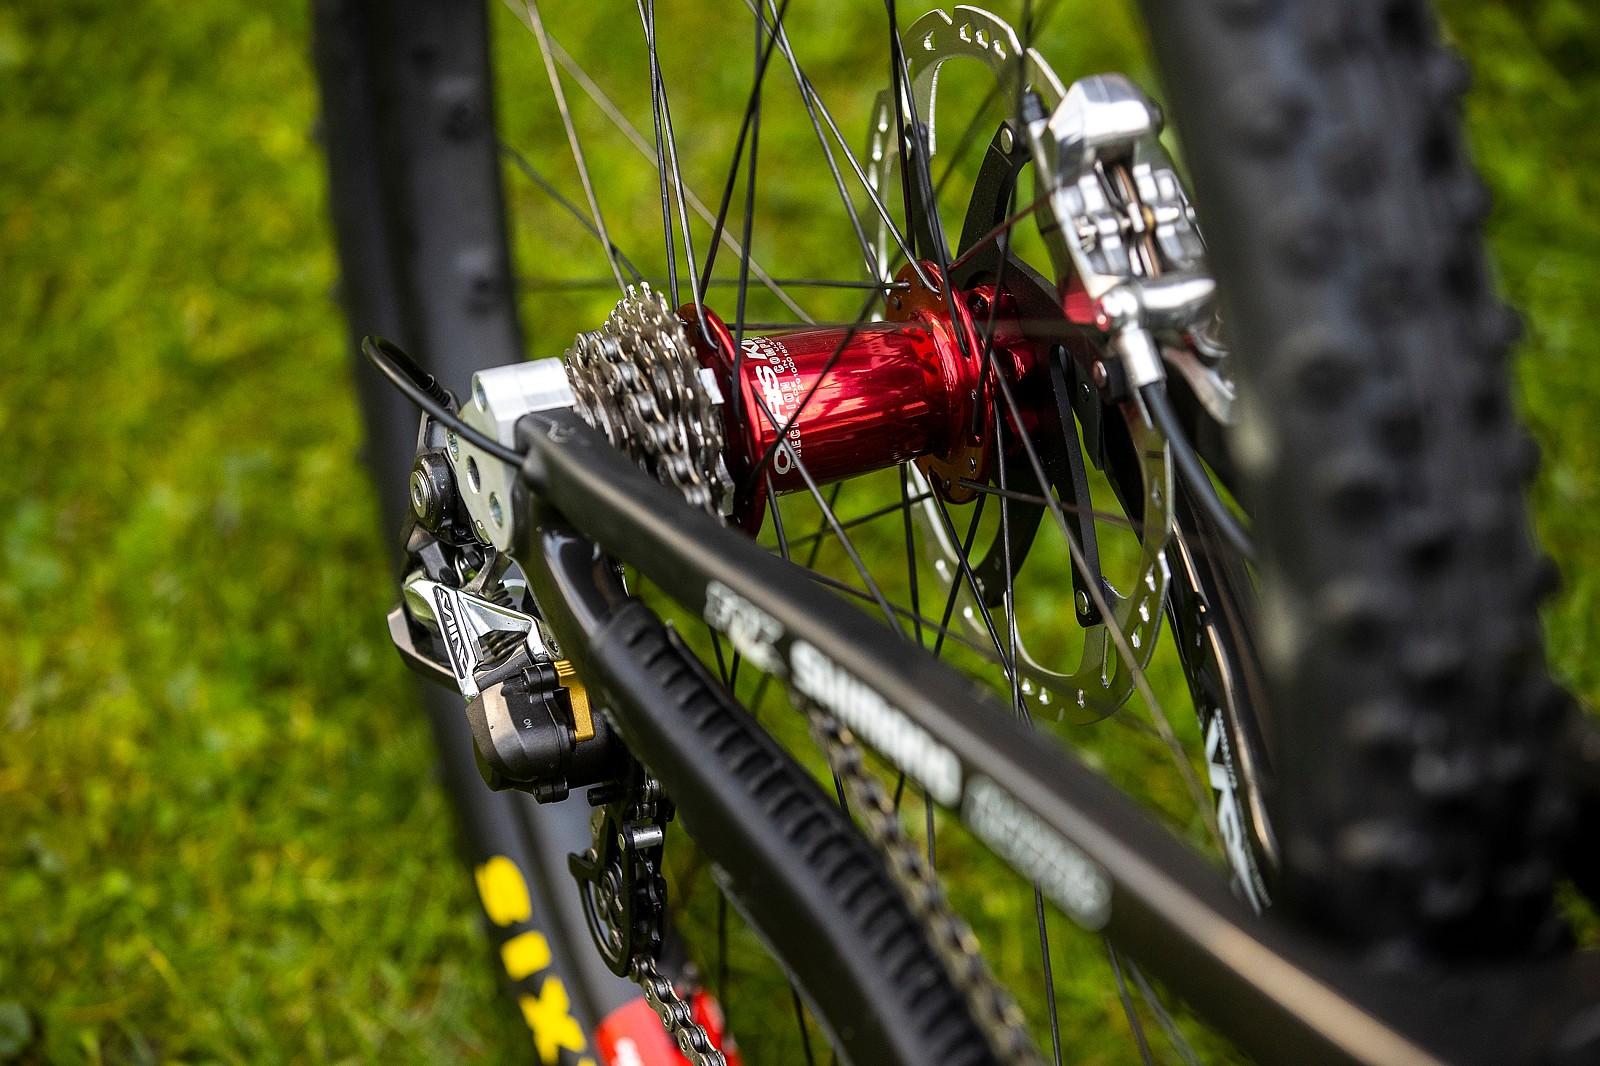 Refined - WORLD CHAMPS BIKE - Greg Minnaar's Santa Cruz V10 - Mountain Biking Pictures - Vital MTB